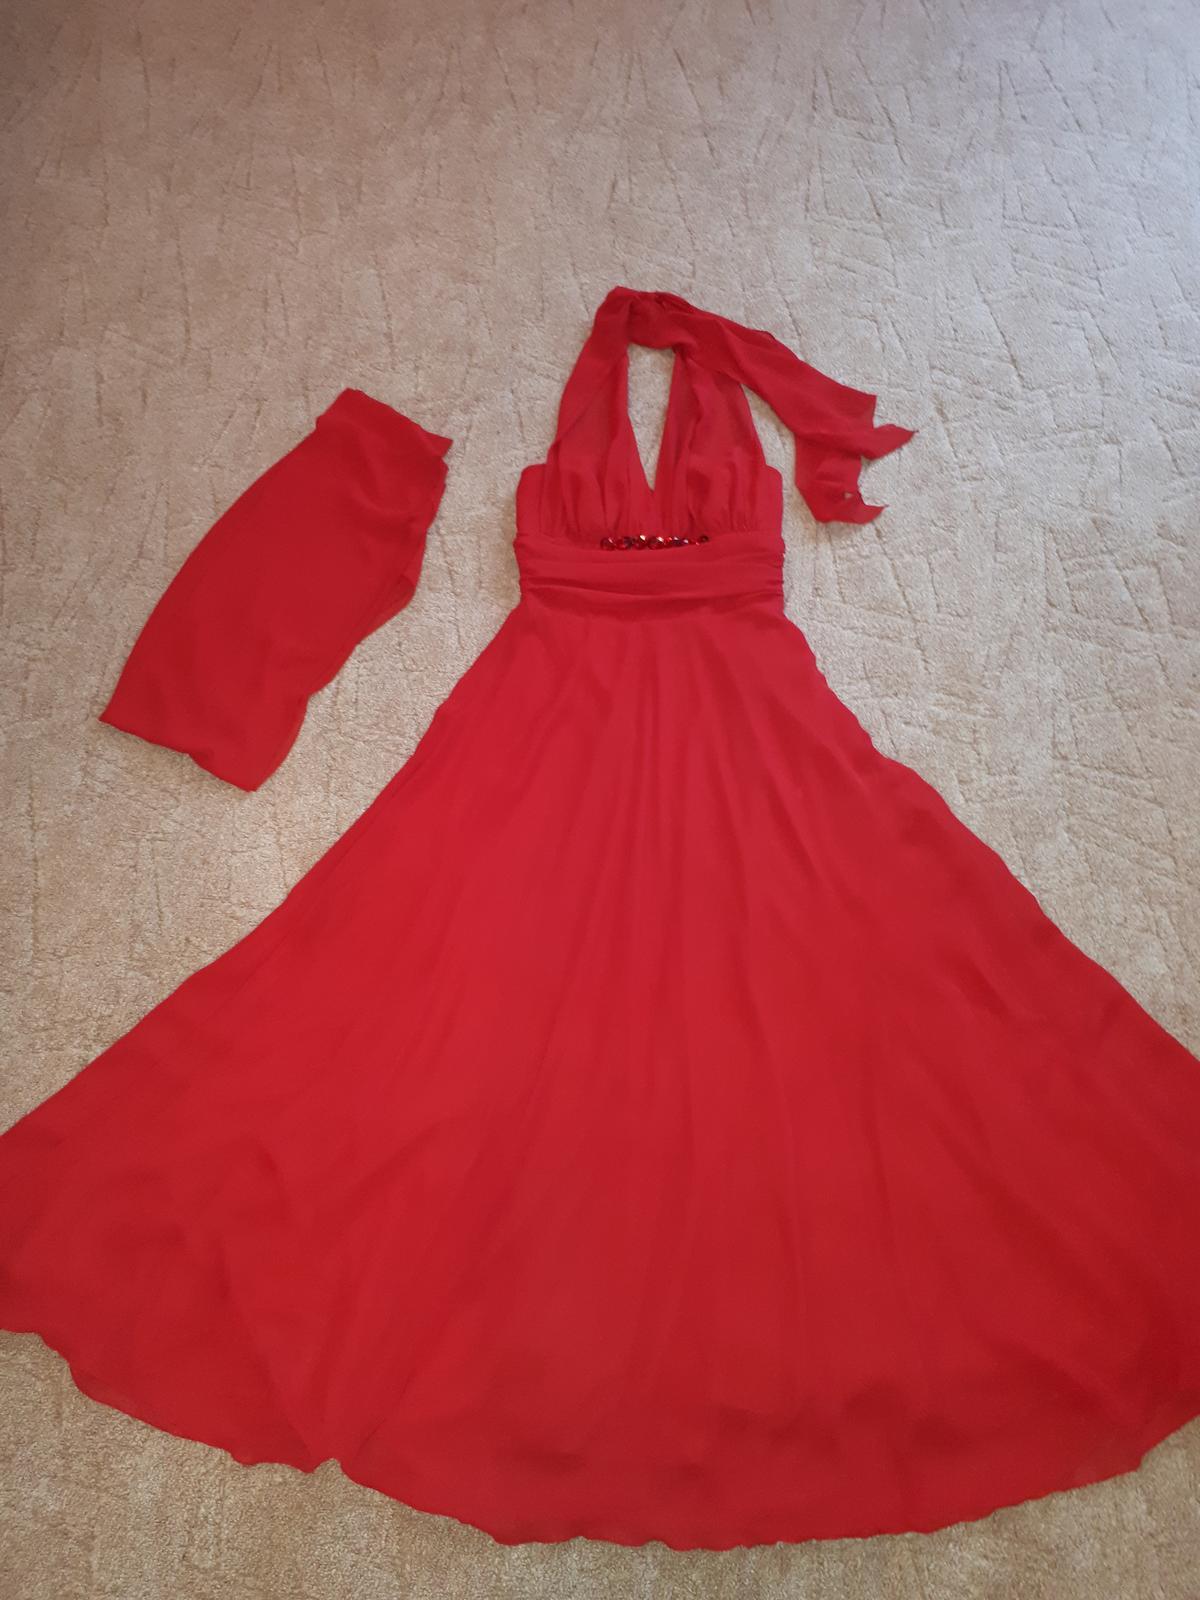 Červené spoločenské šaty - Obrázok č. 2